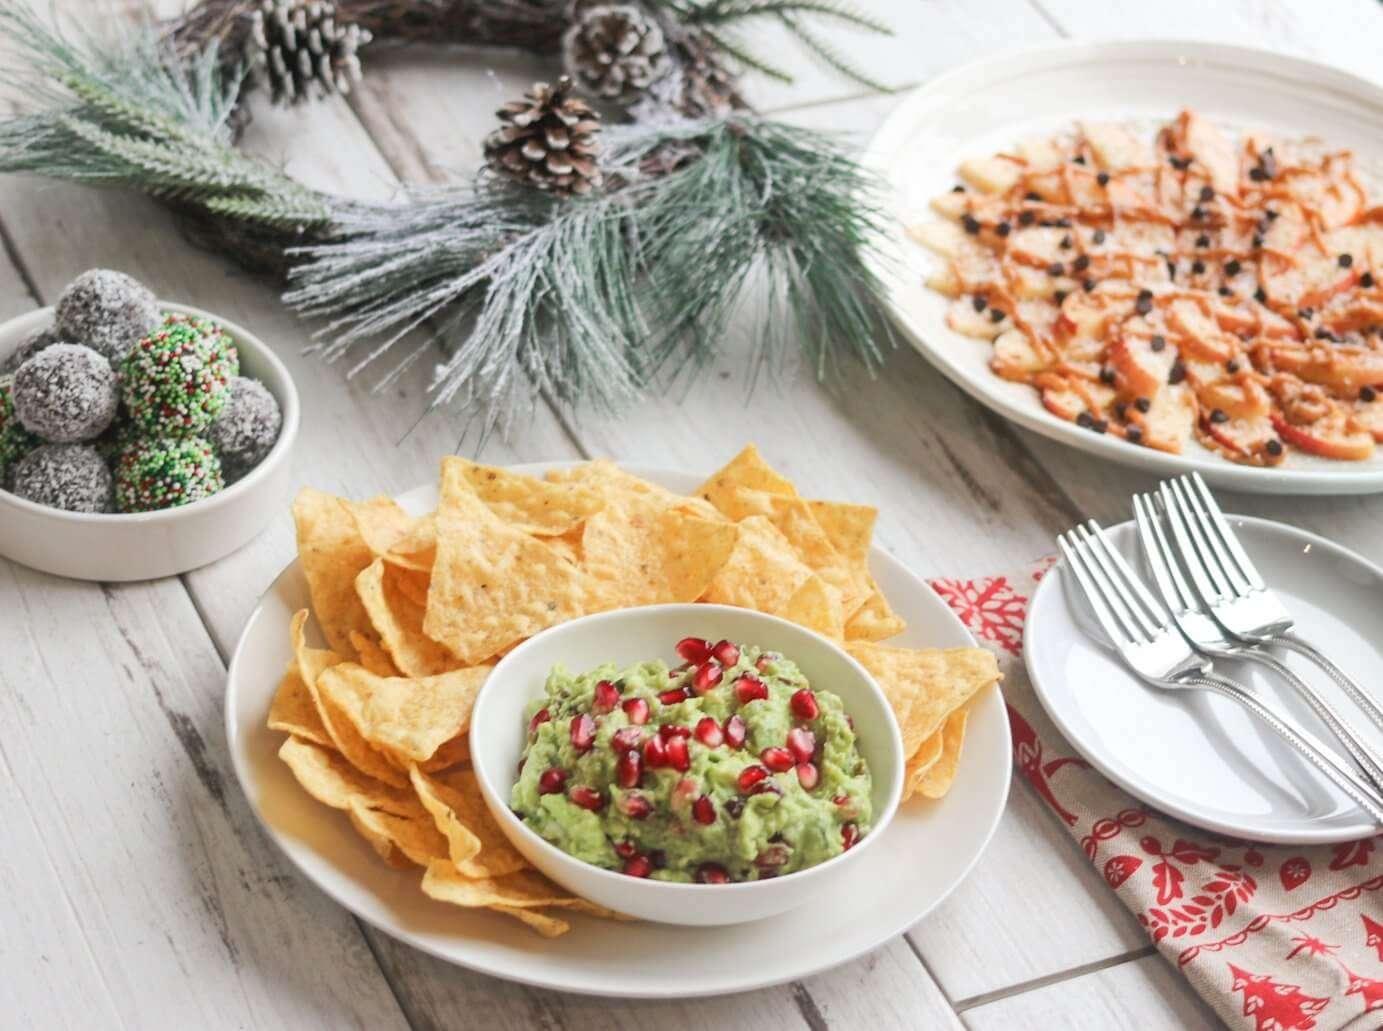 Holiday snack ideas by julie miguel food expert breakfast television on dailytiramisu.com